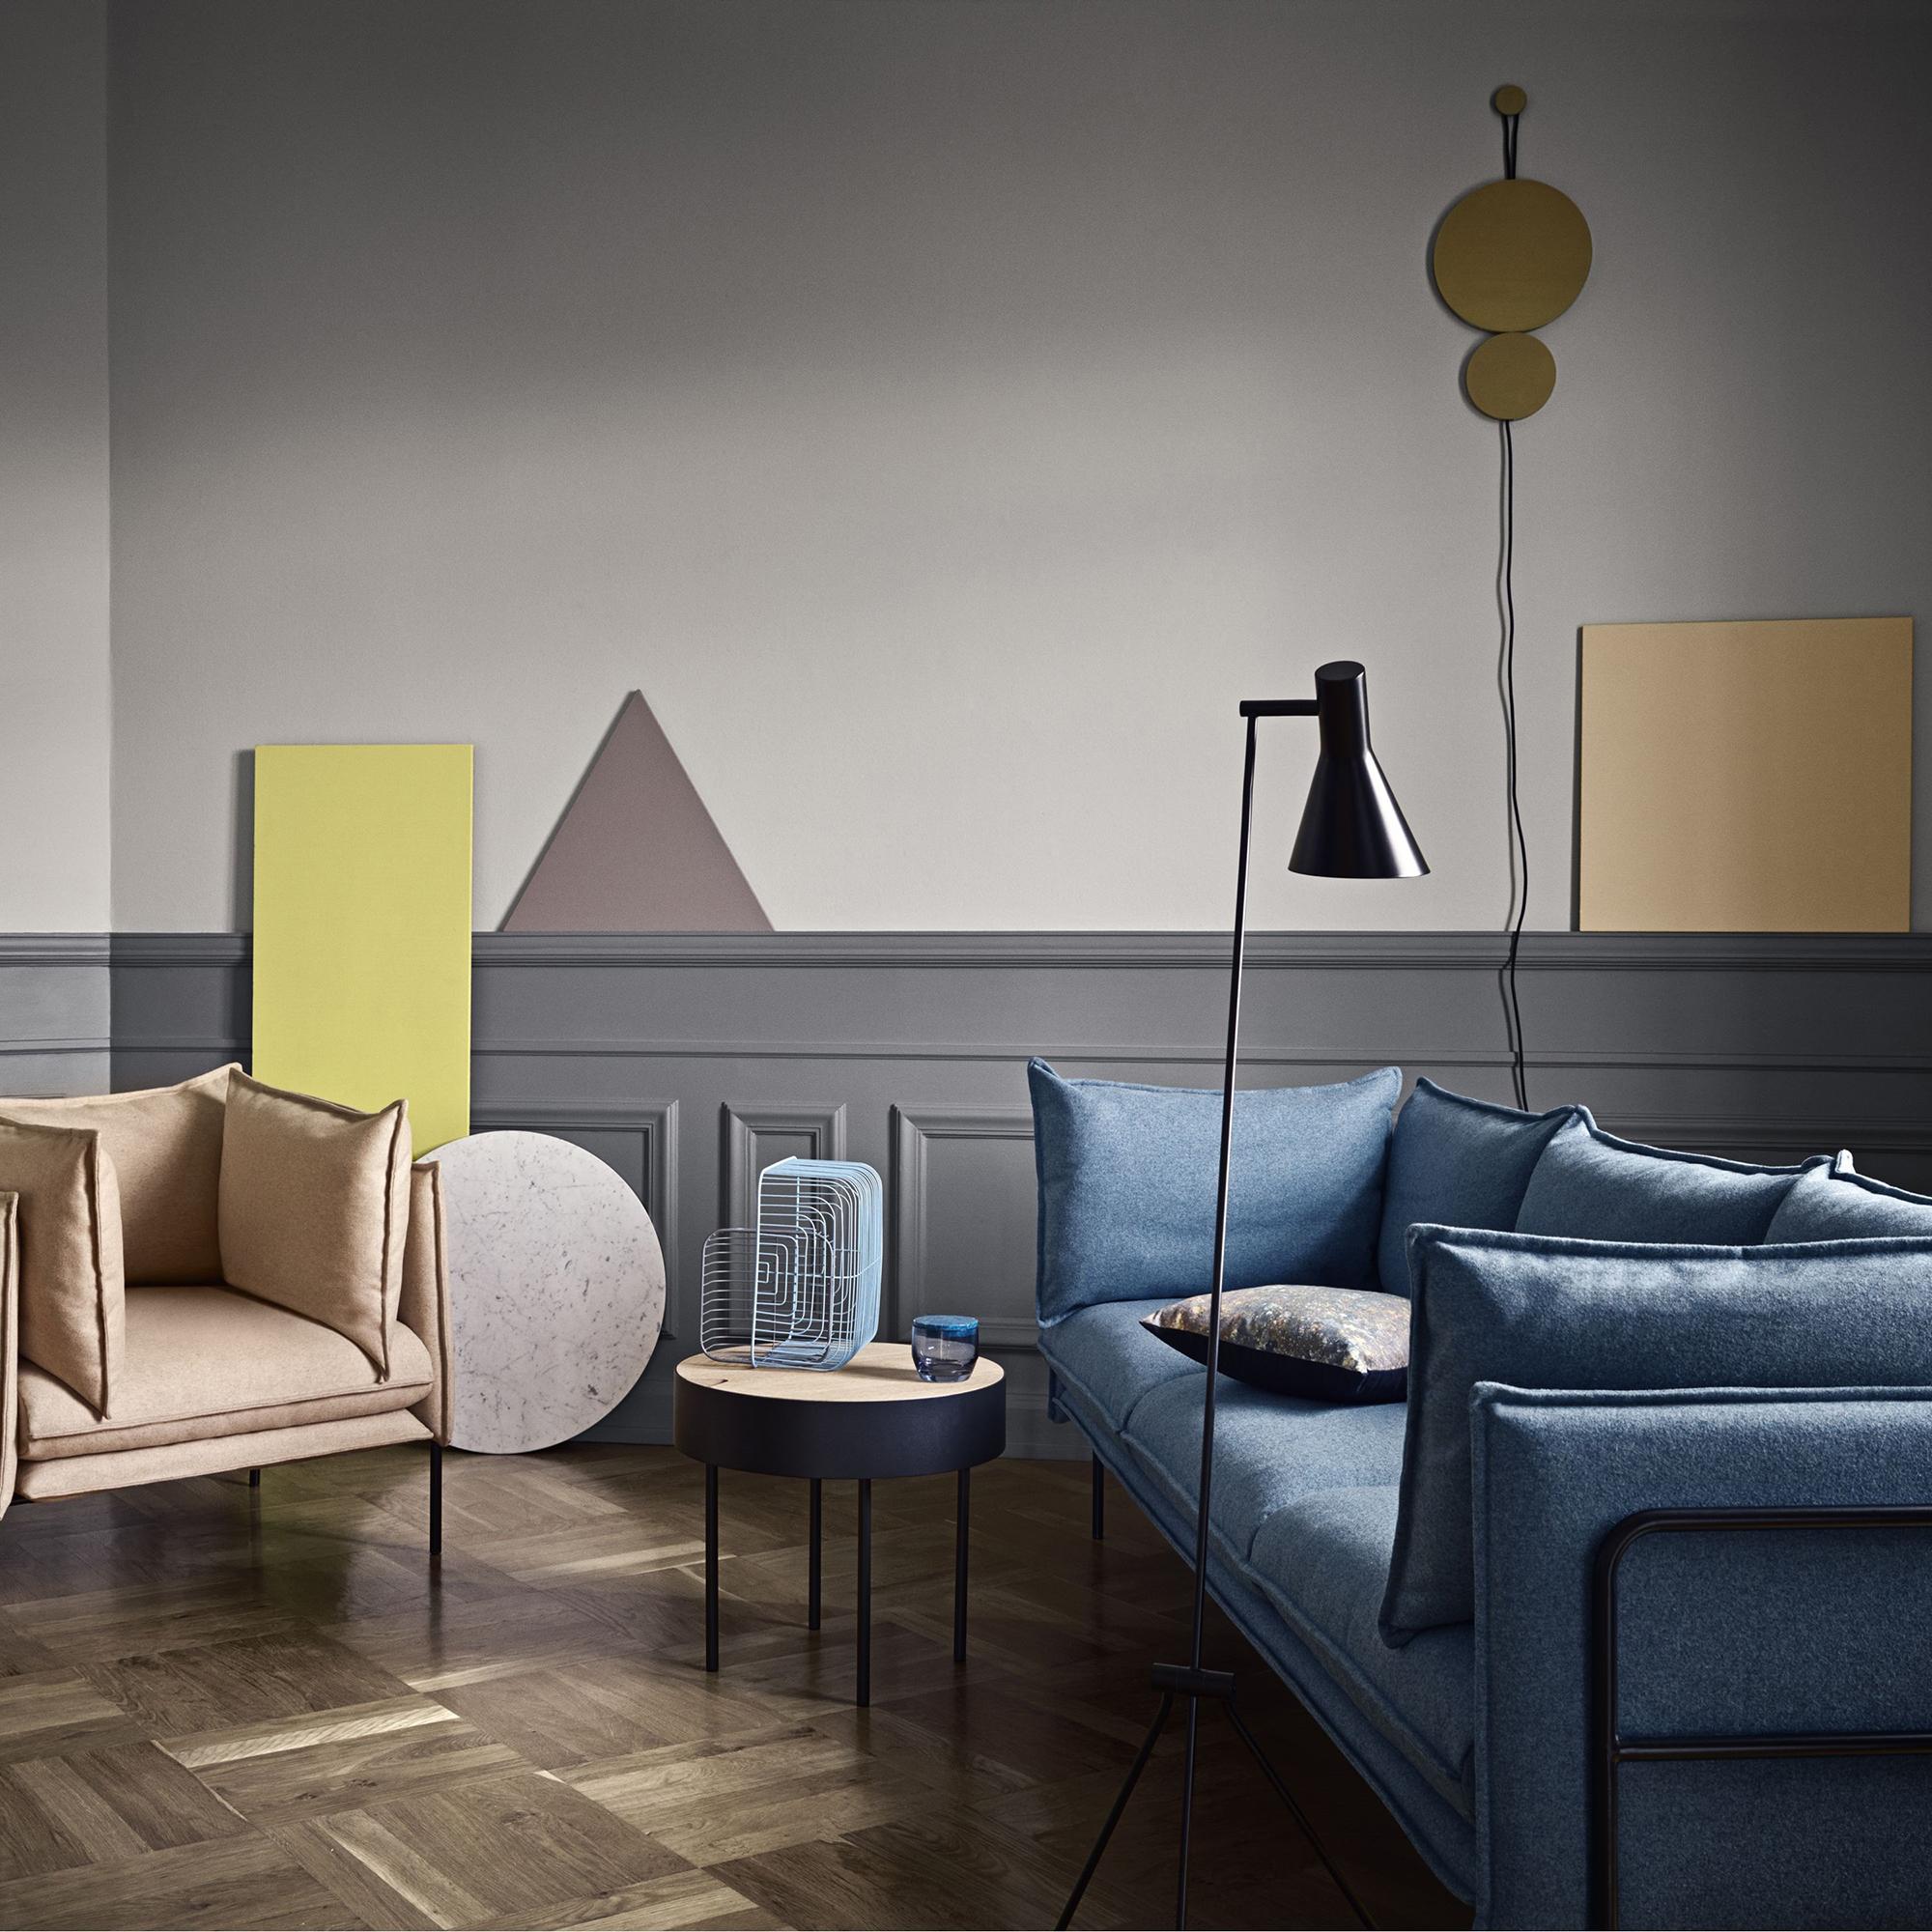 Home & Lounge Poništvo